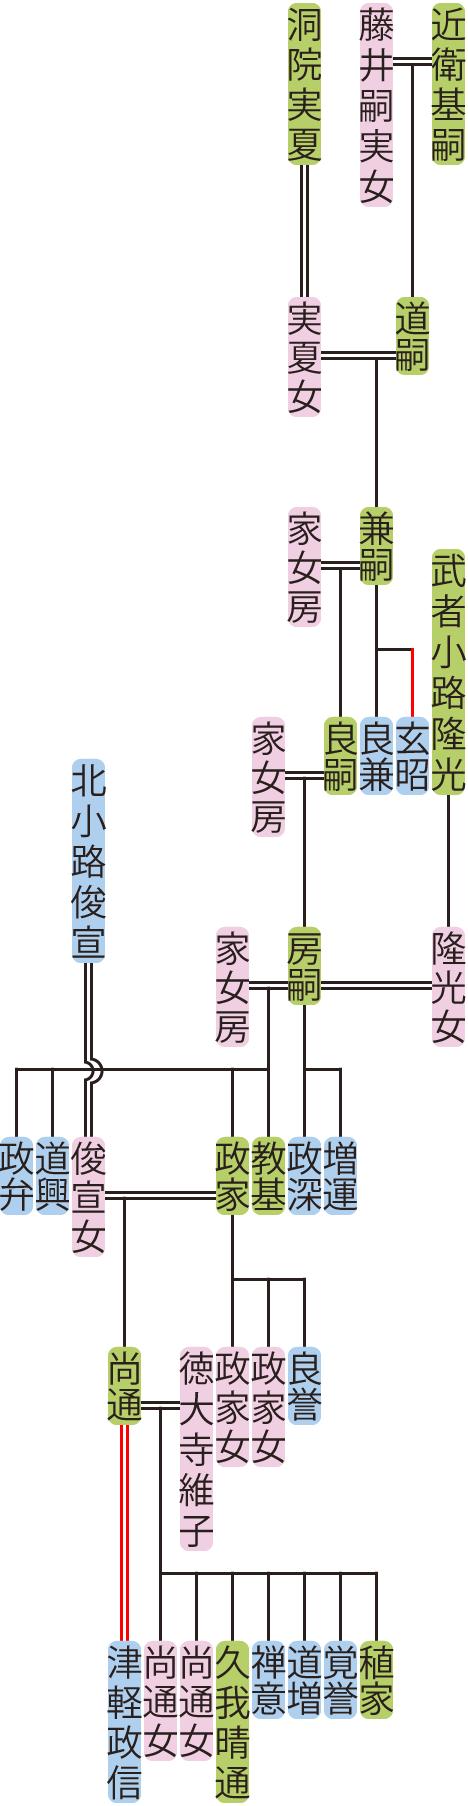 近衛兼嗣~政家の系図